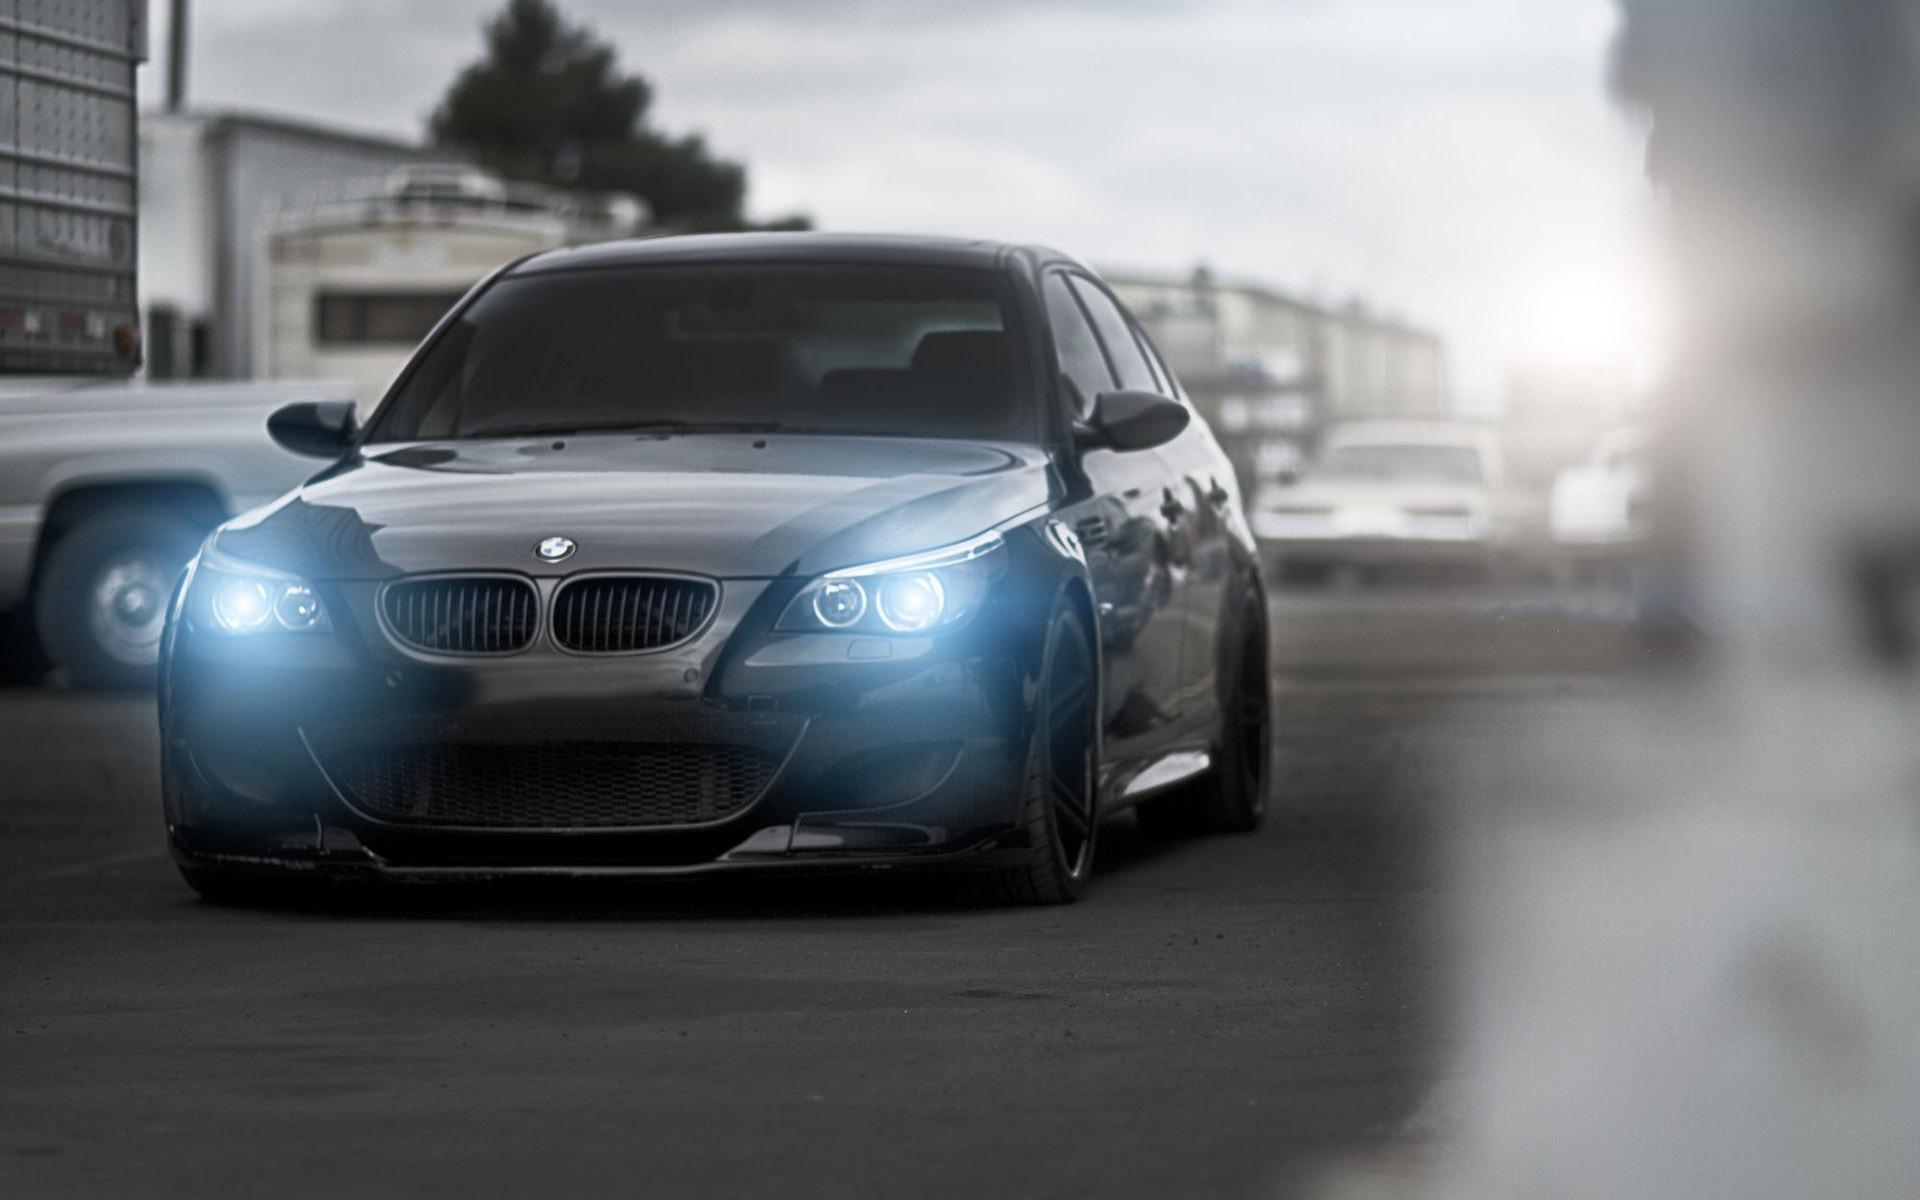 BMW M5 E60 HD Wallpaper 1920x1080 BMW M5 E60 HD Wallpaper 1920x1200 1920x1200